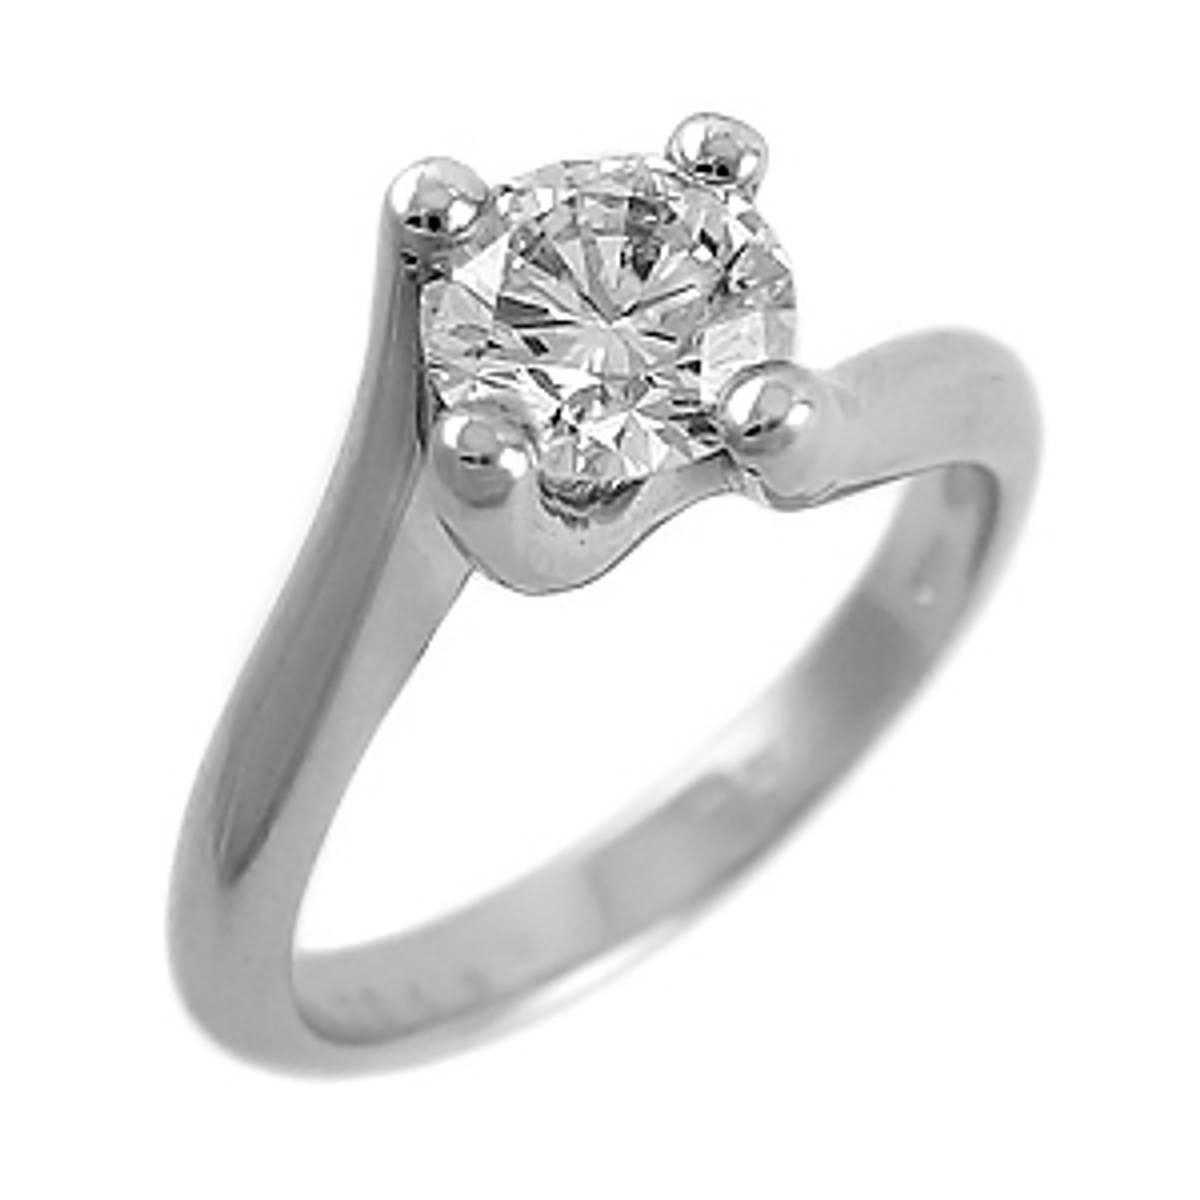 Irish made0.34ct brilliant cut diamond engagement ring set in 18ct white gold